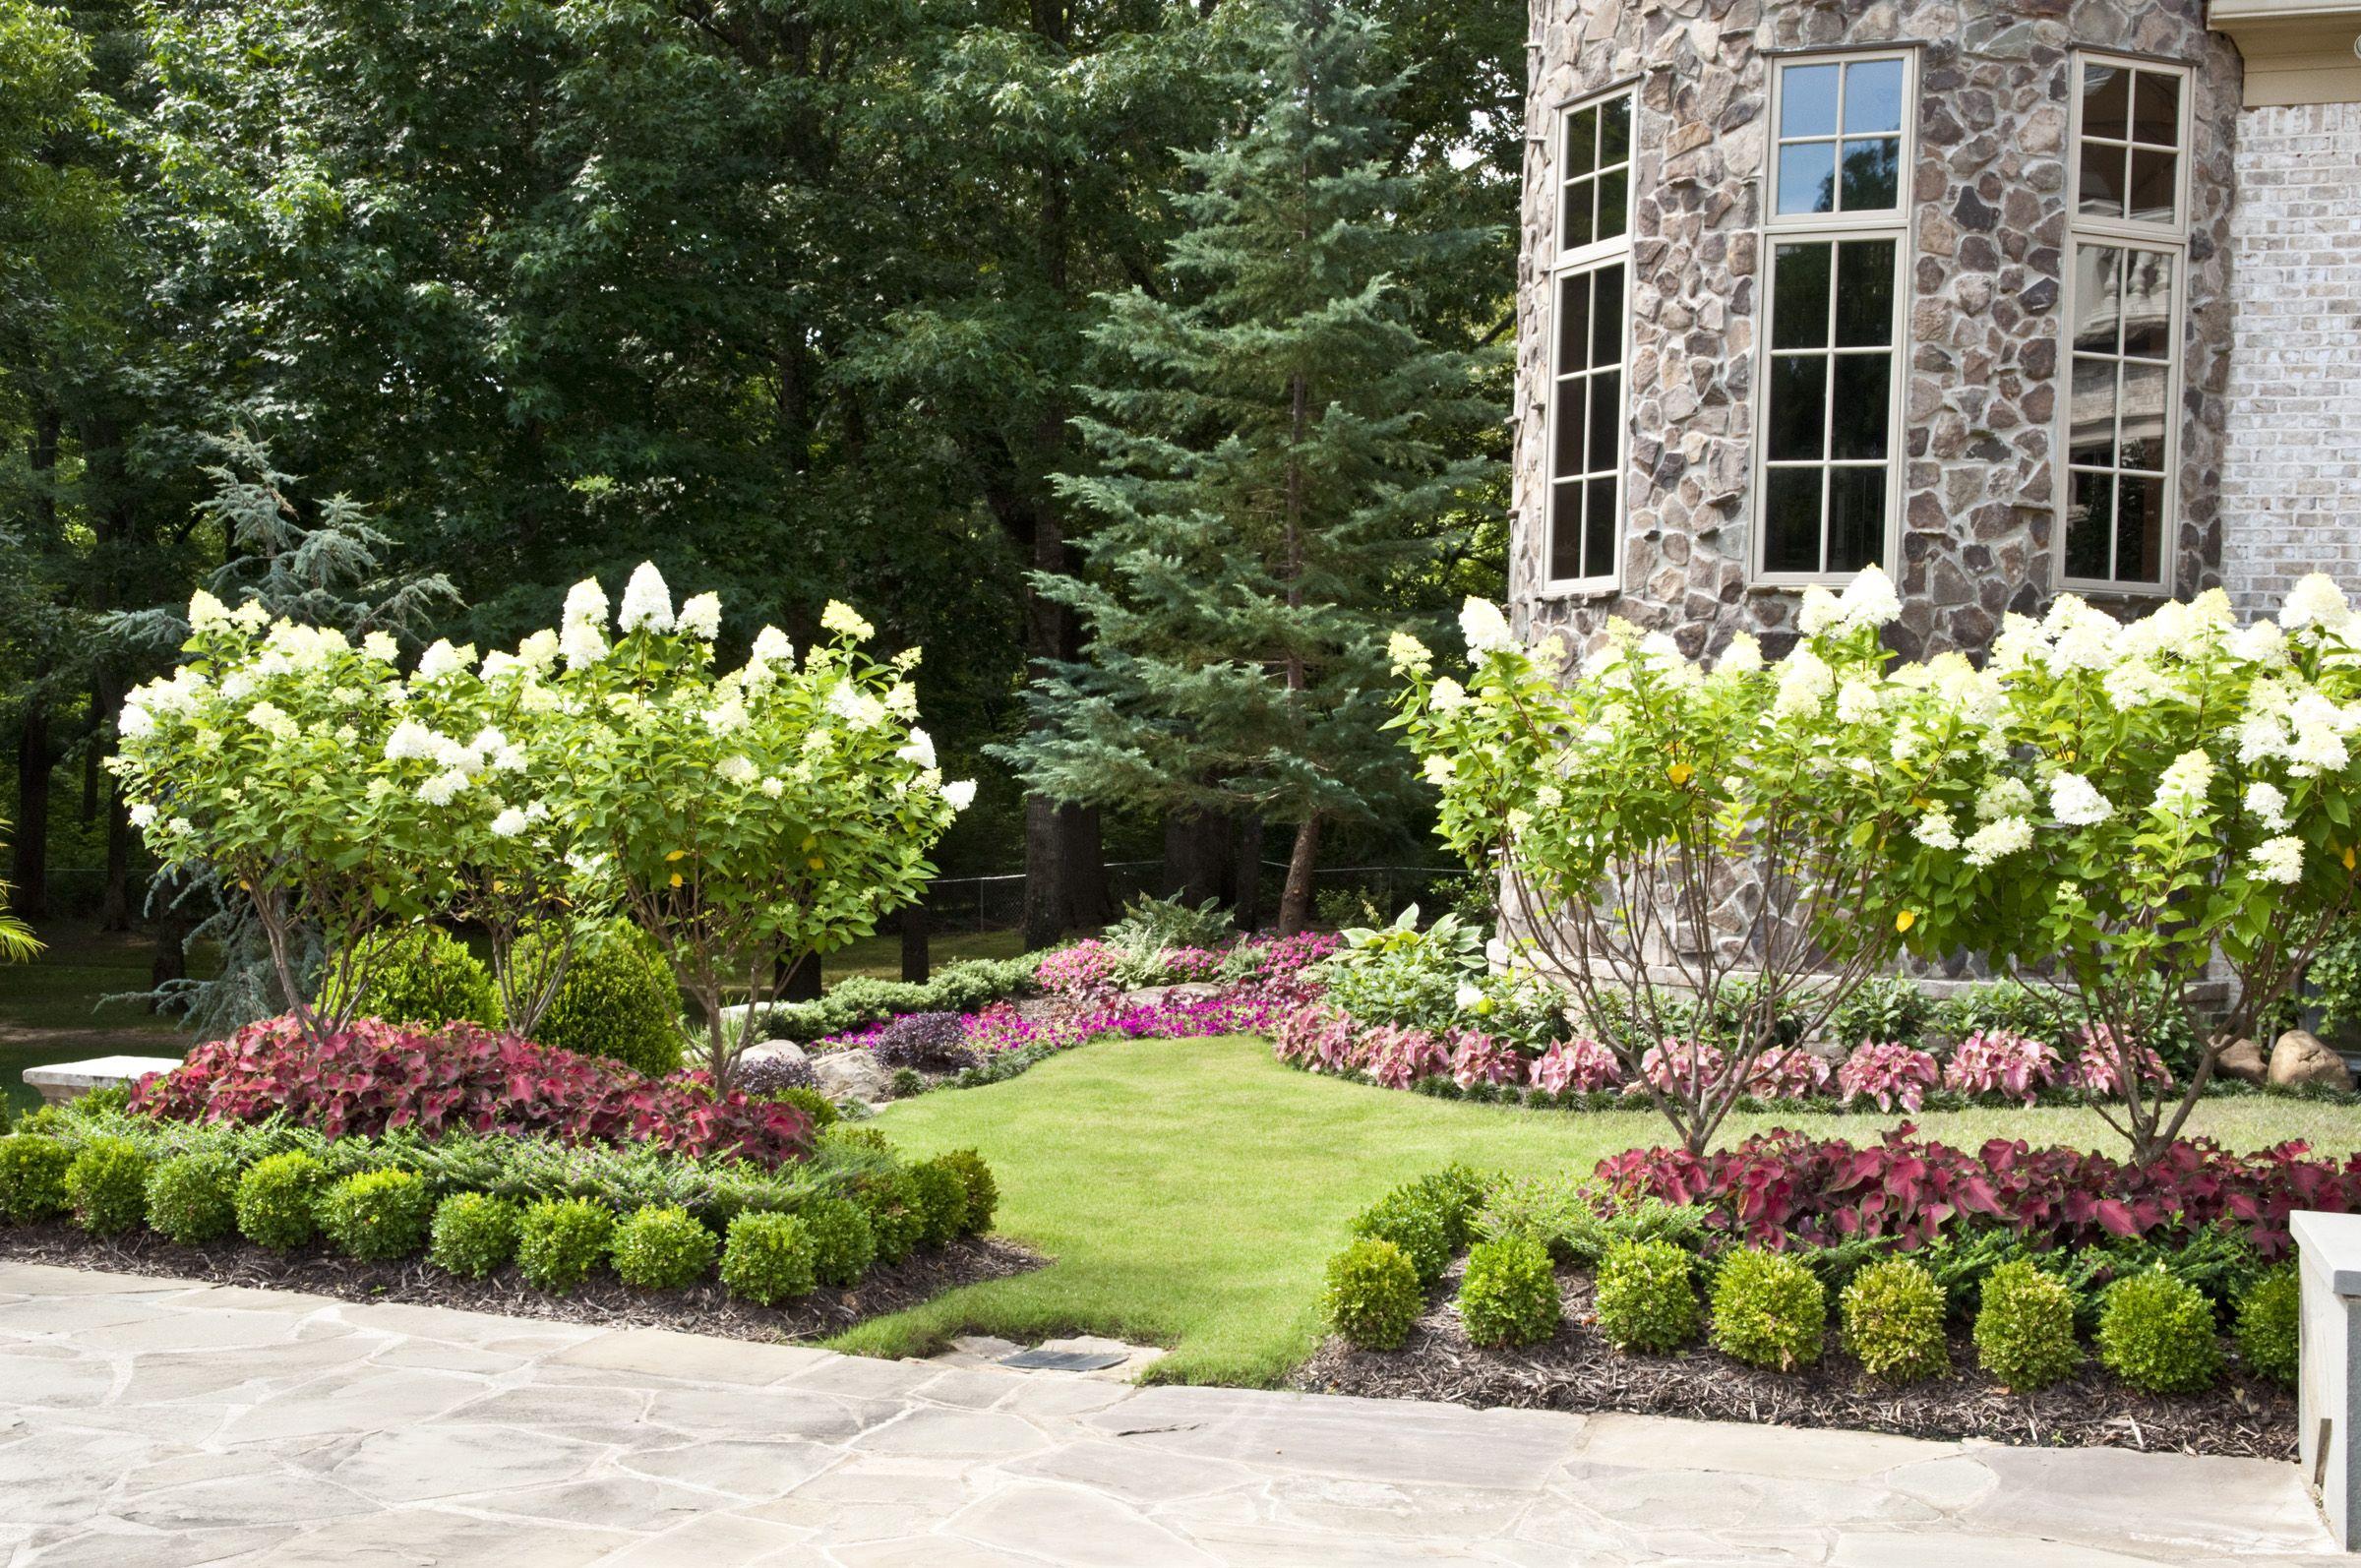 Treeform Limelight Hydrangea U0026 Seasonal Plantings By Gurleyu0027s Azalea Garden,  Inc.  Memphis,